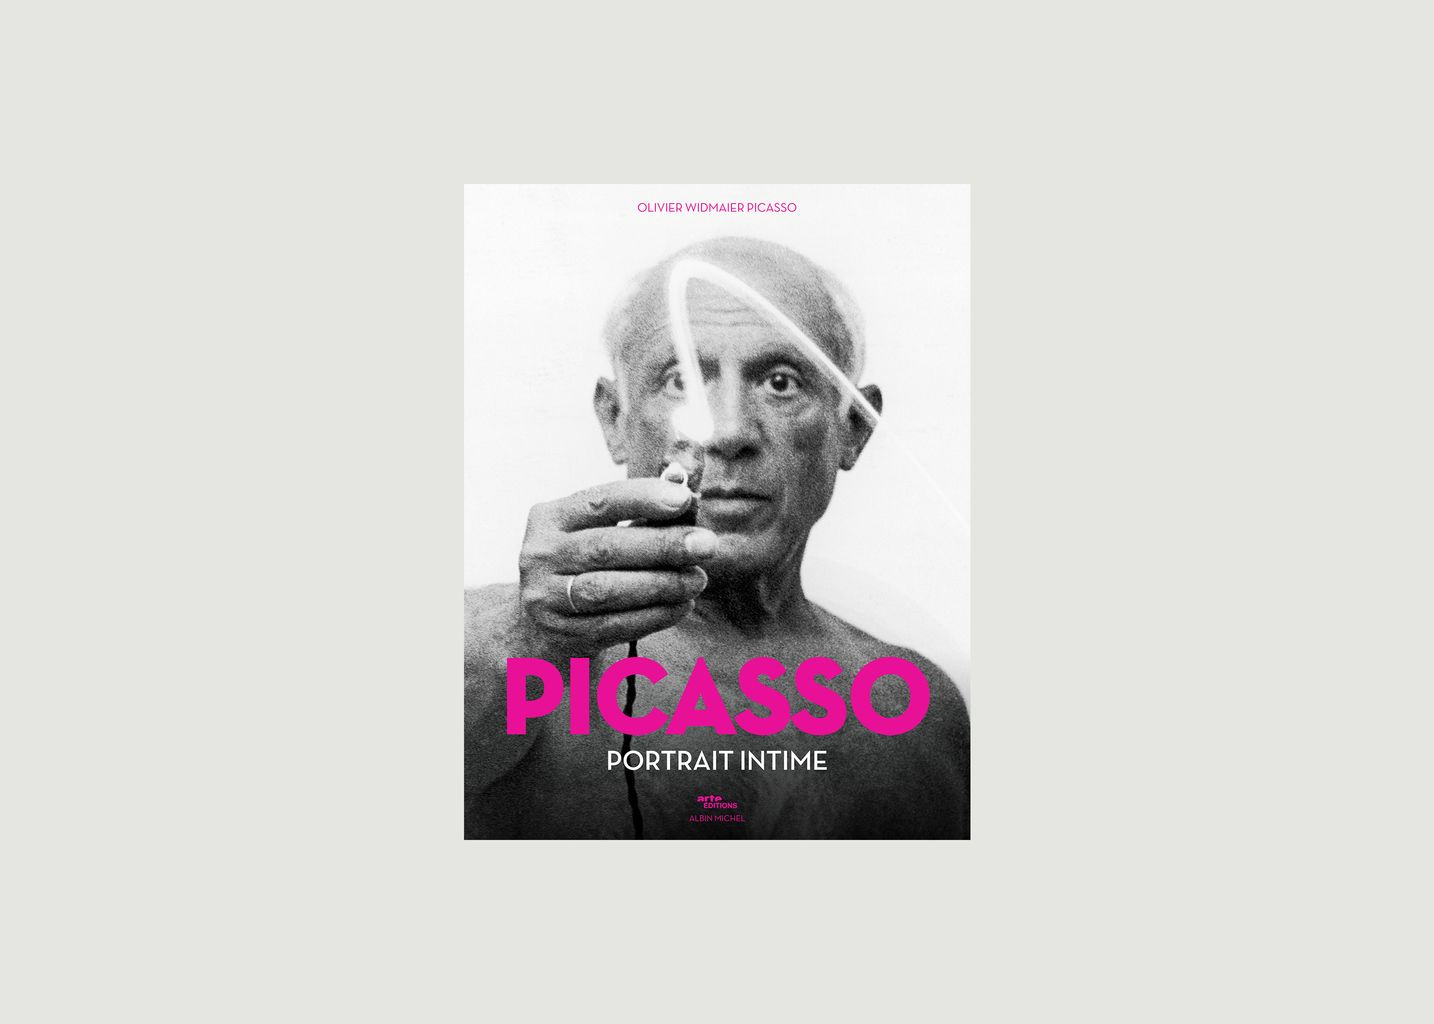 Picasso, Portrait Intime  - La Librairie